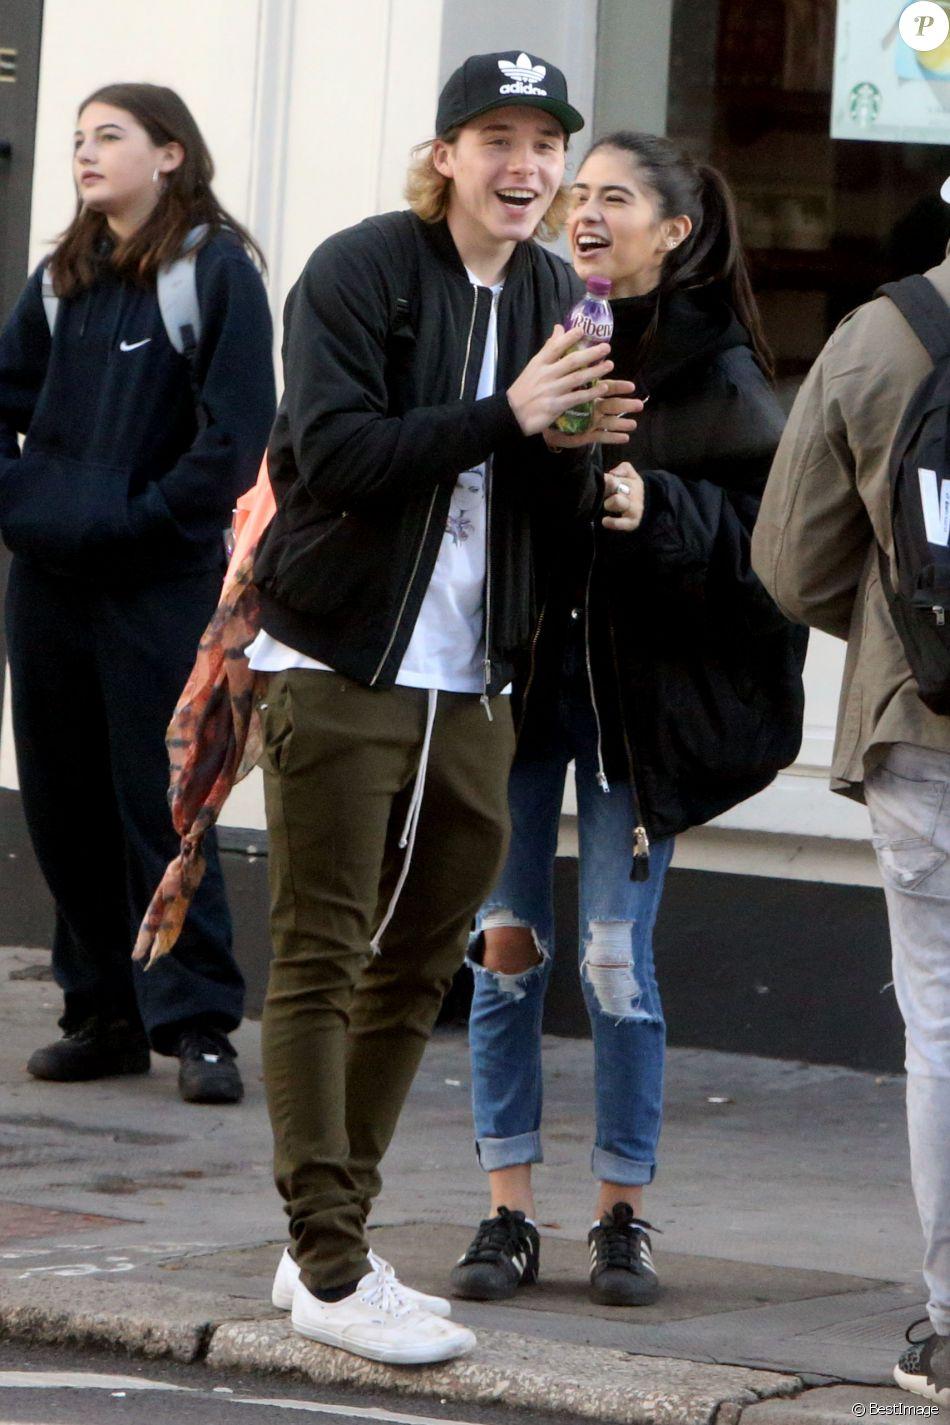 Exclusif - Brooklyn Beckham avec Kim Turnbull, la supposée petite amie de Rocco Ritchie discutent dans la rue à Londres, le 17 octobre 2016.